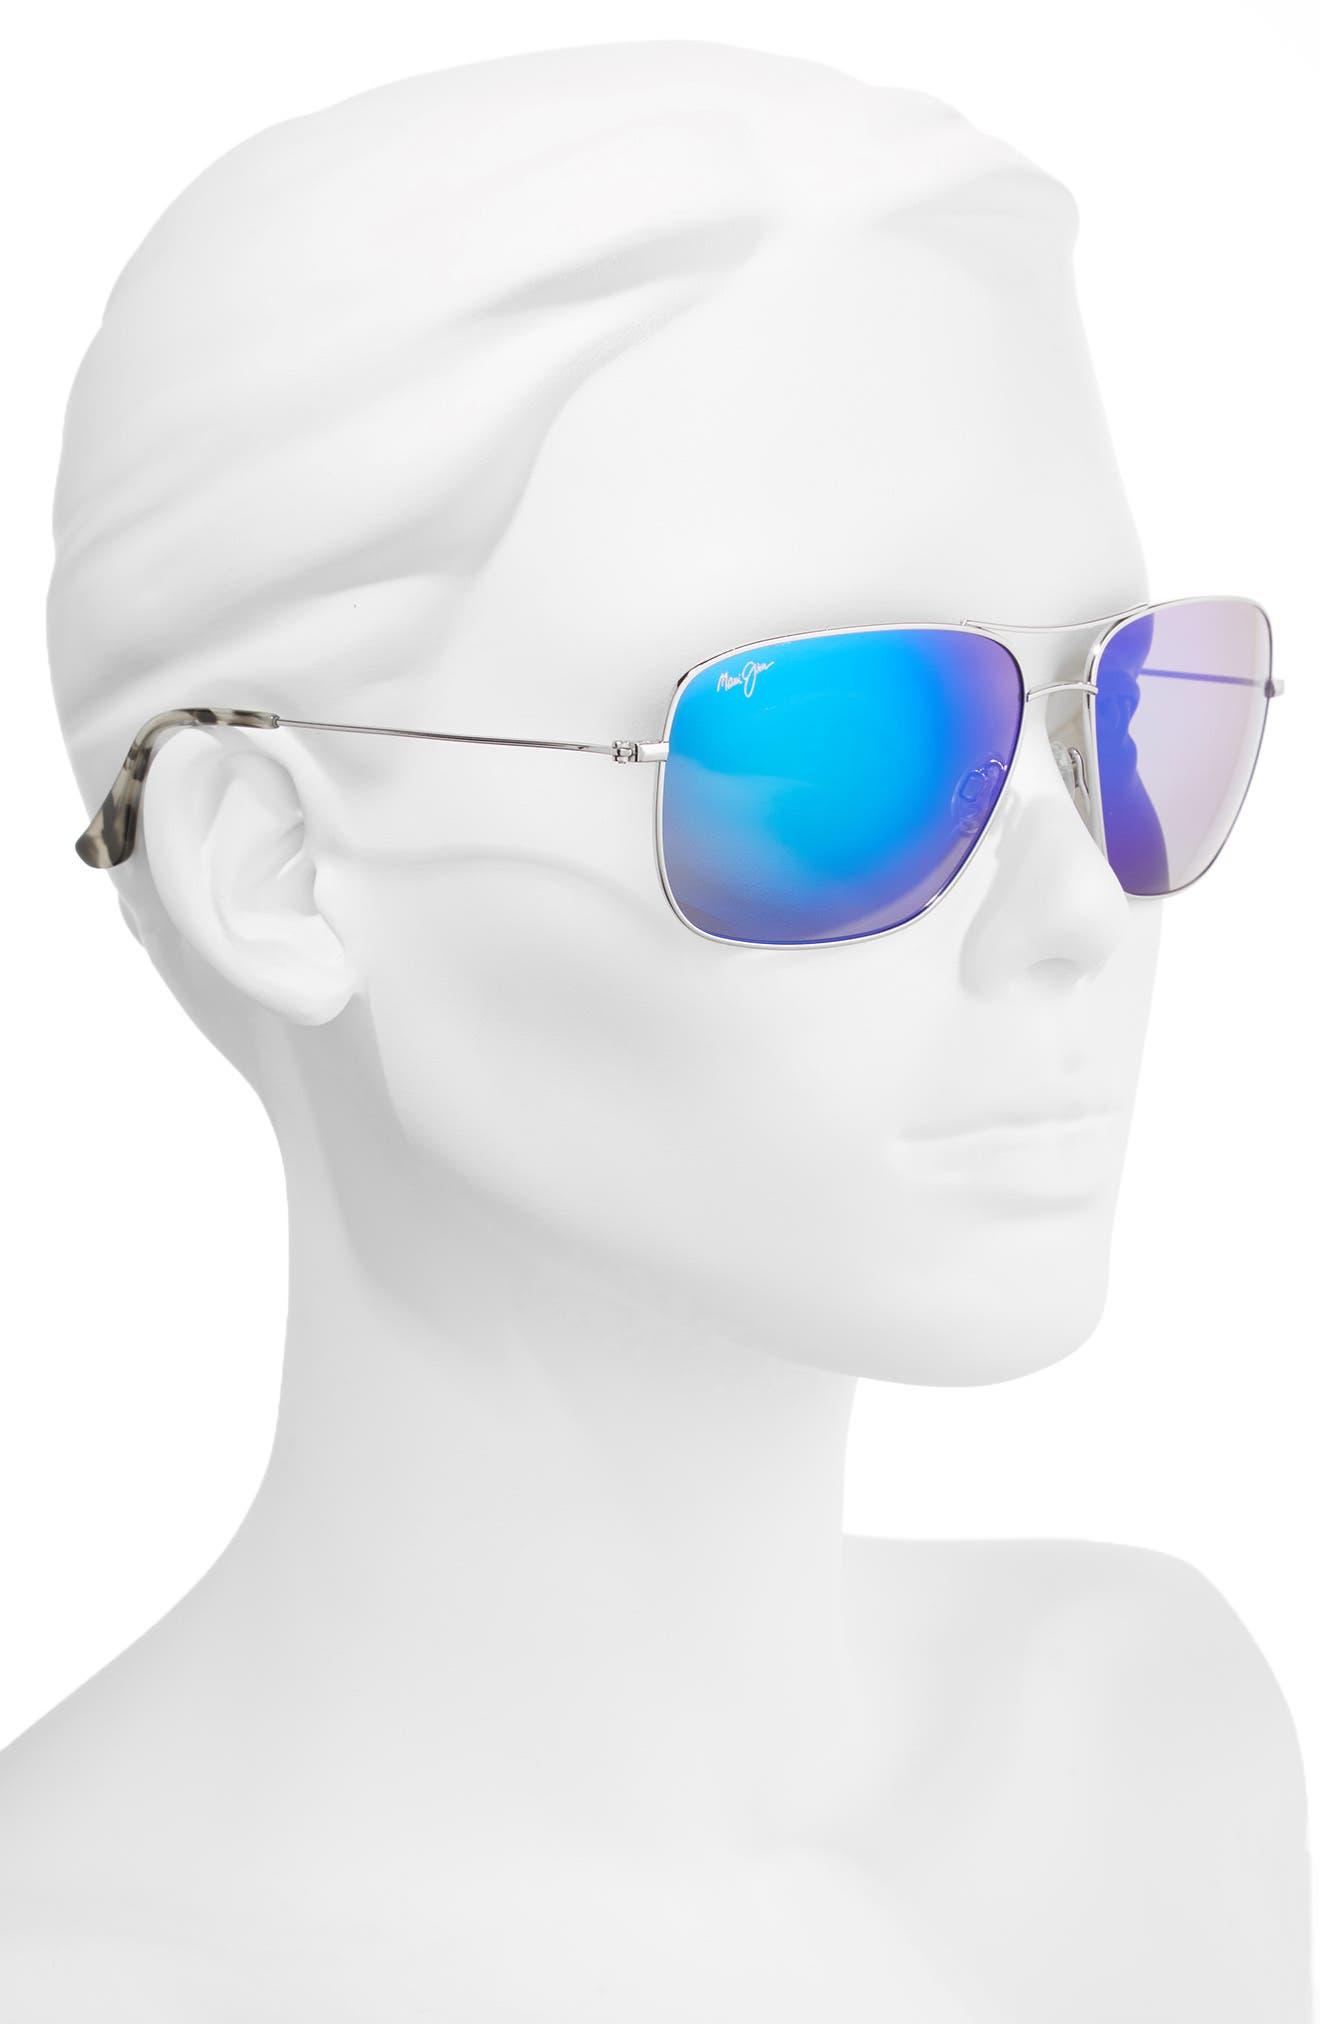 Cook Pines 63mm Polarized Titanium Aviator Sunglasses,                             Alternate thumbnail 2, color,                             Silver/ Blue Hawaii